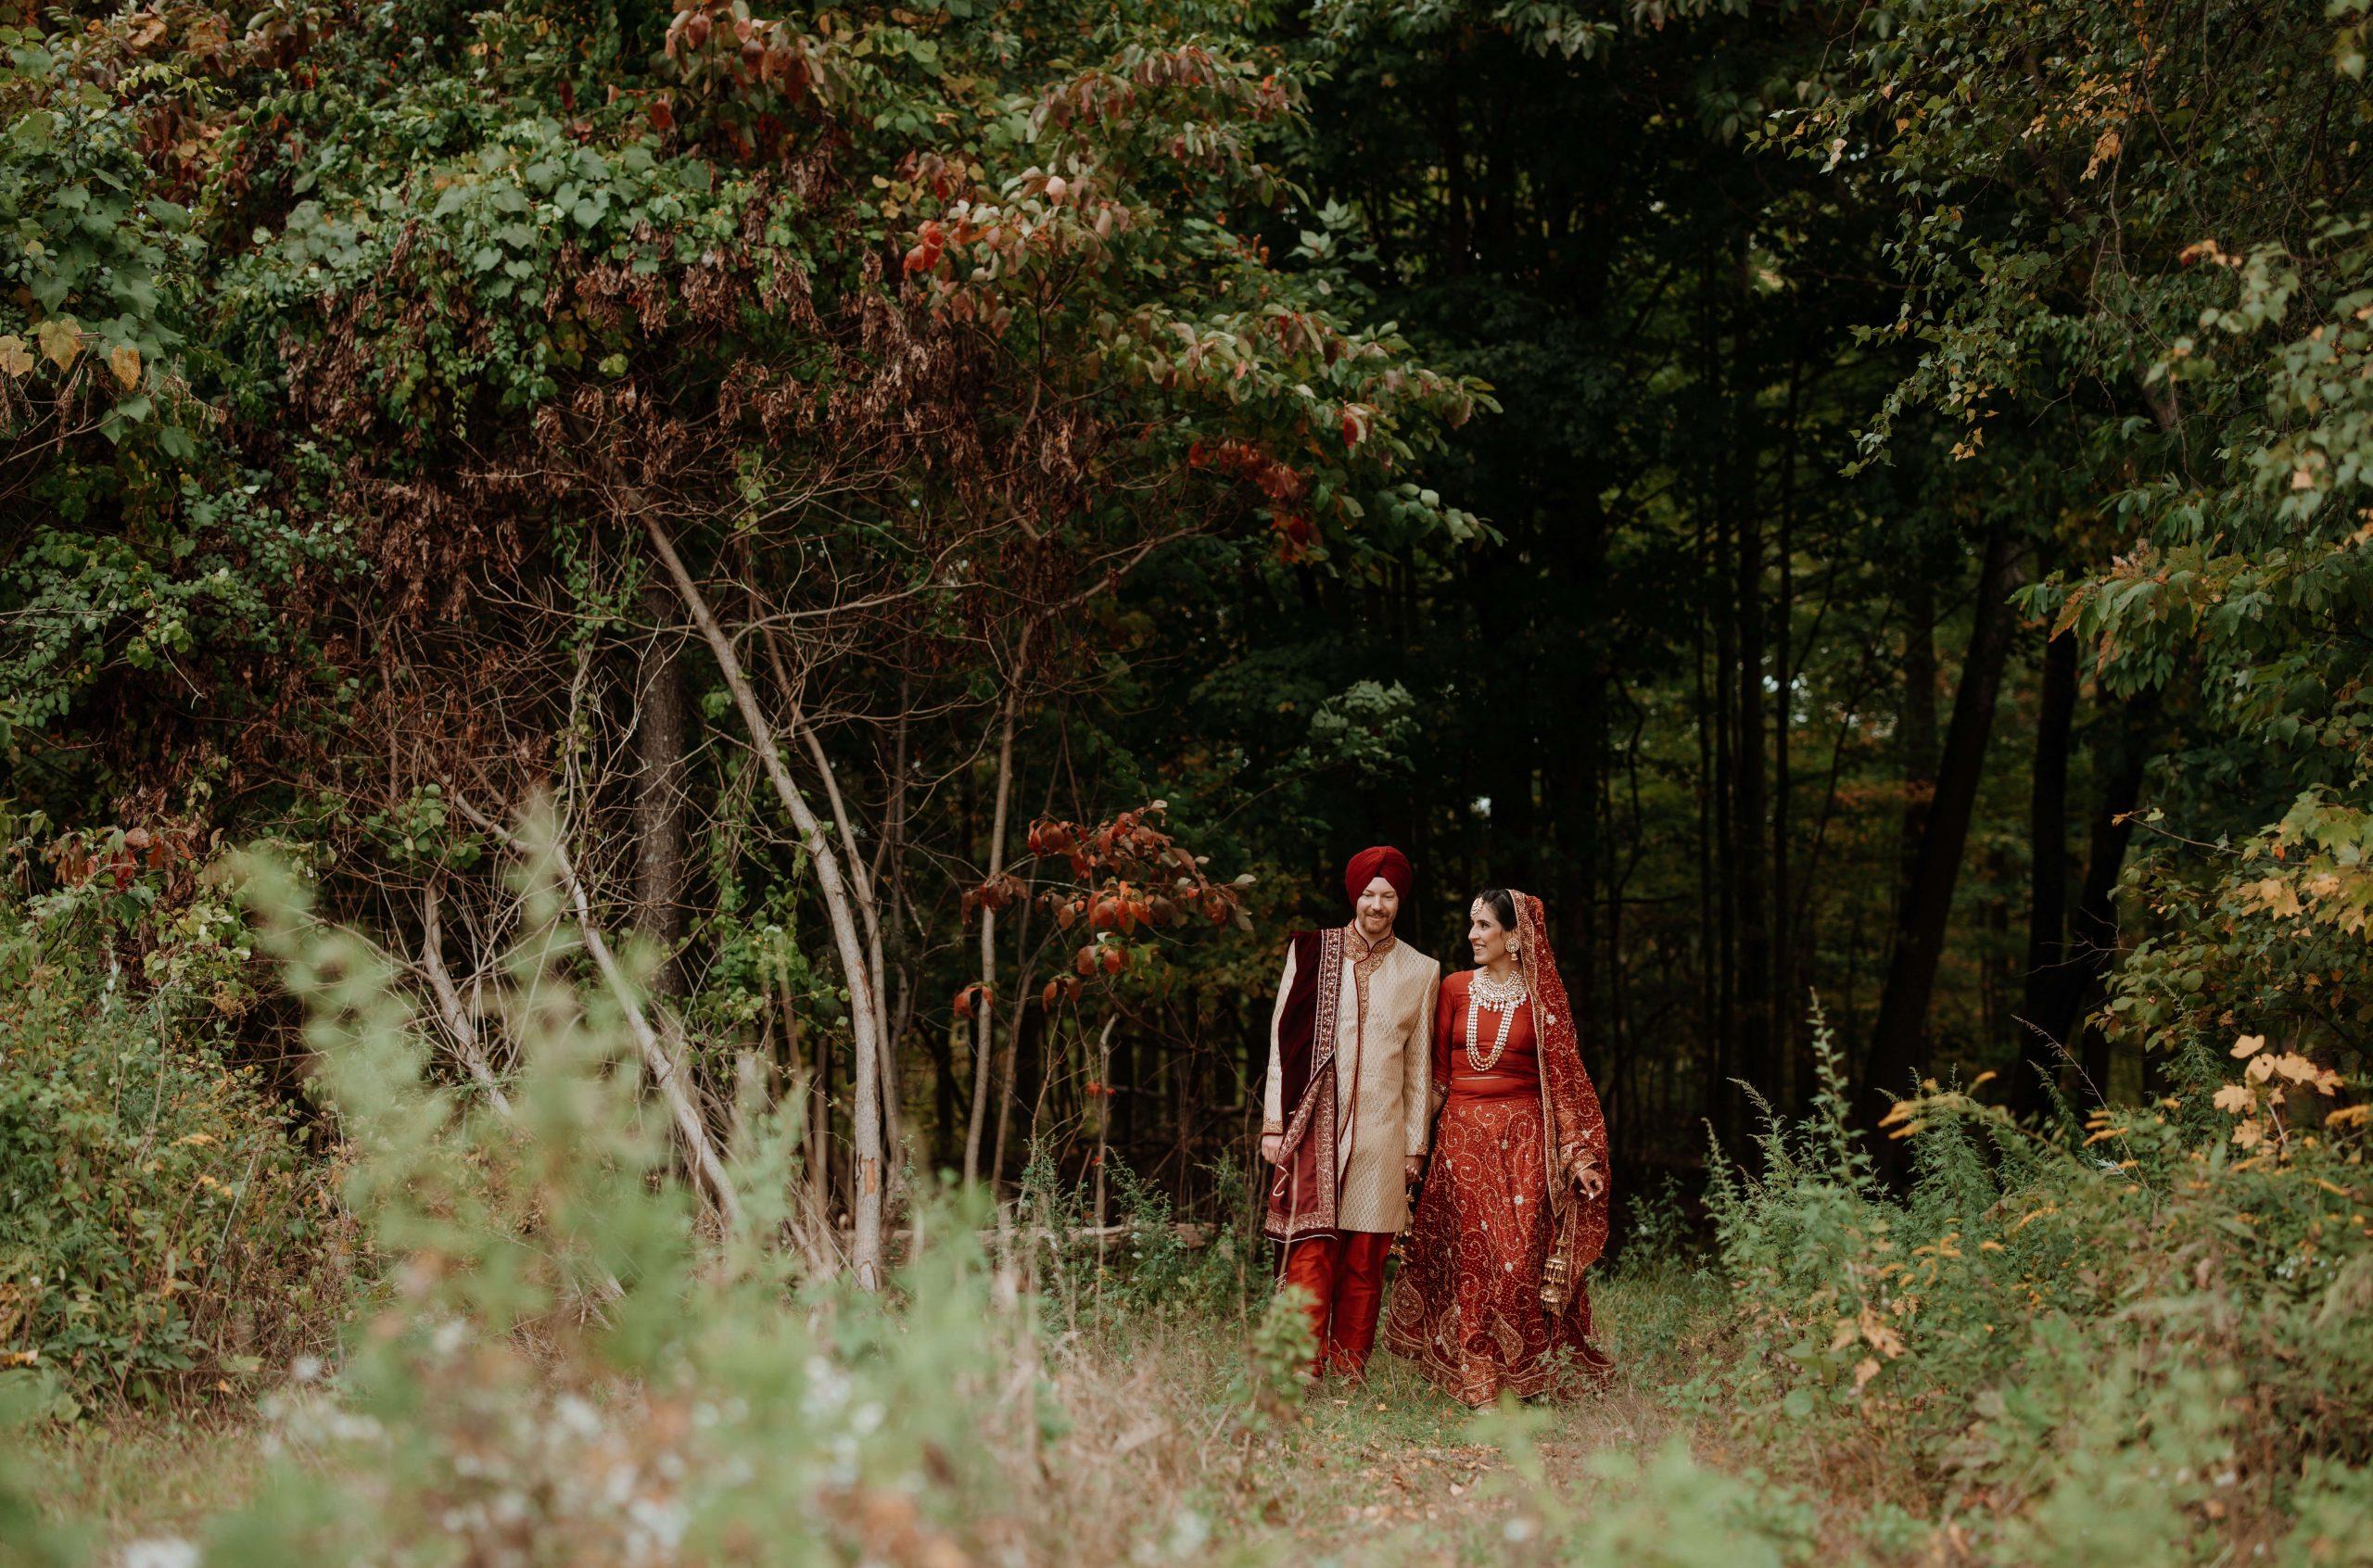 Arius-Photography-September-27-2020-025428